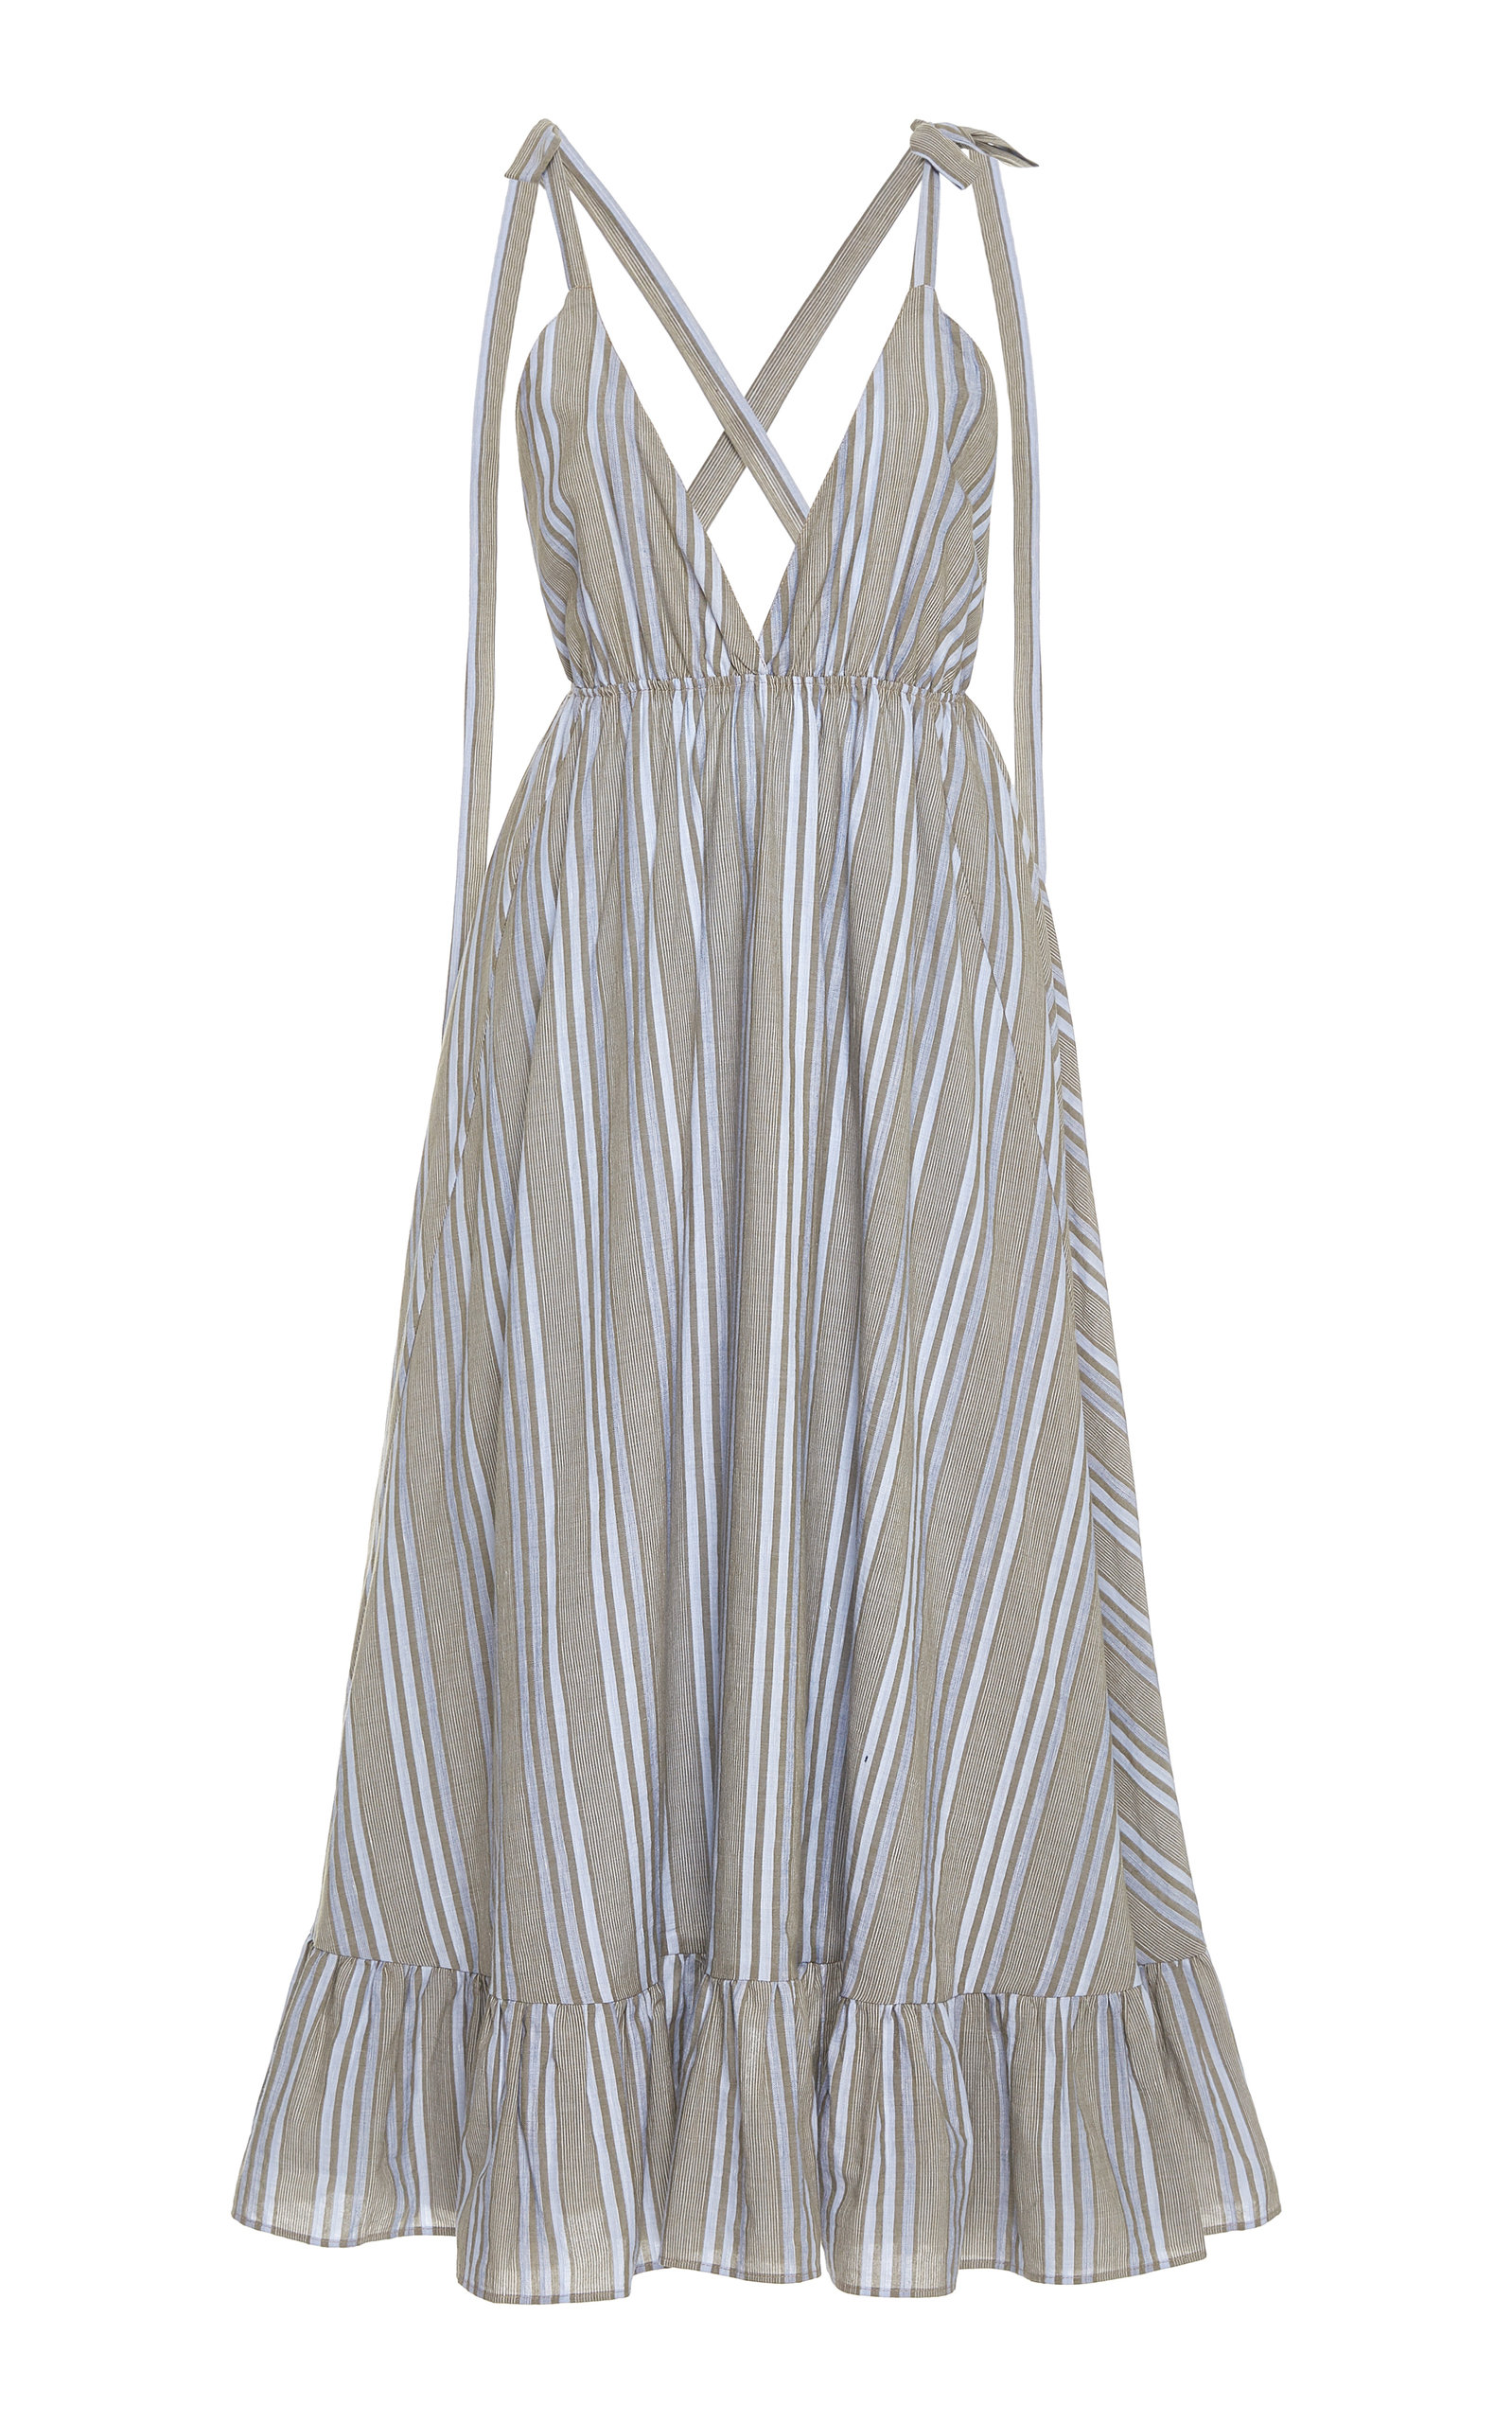 Buy Loup Charmant Amalfi Ruffled Striped Cotton-Poplin Midi Dress online, shop Loup Charmant at the best price